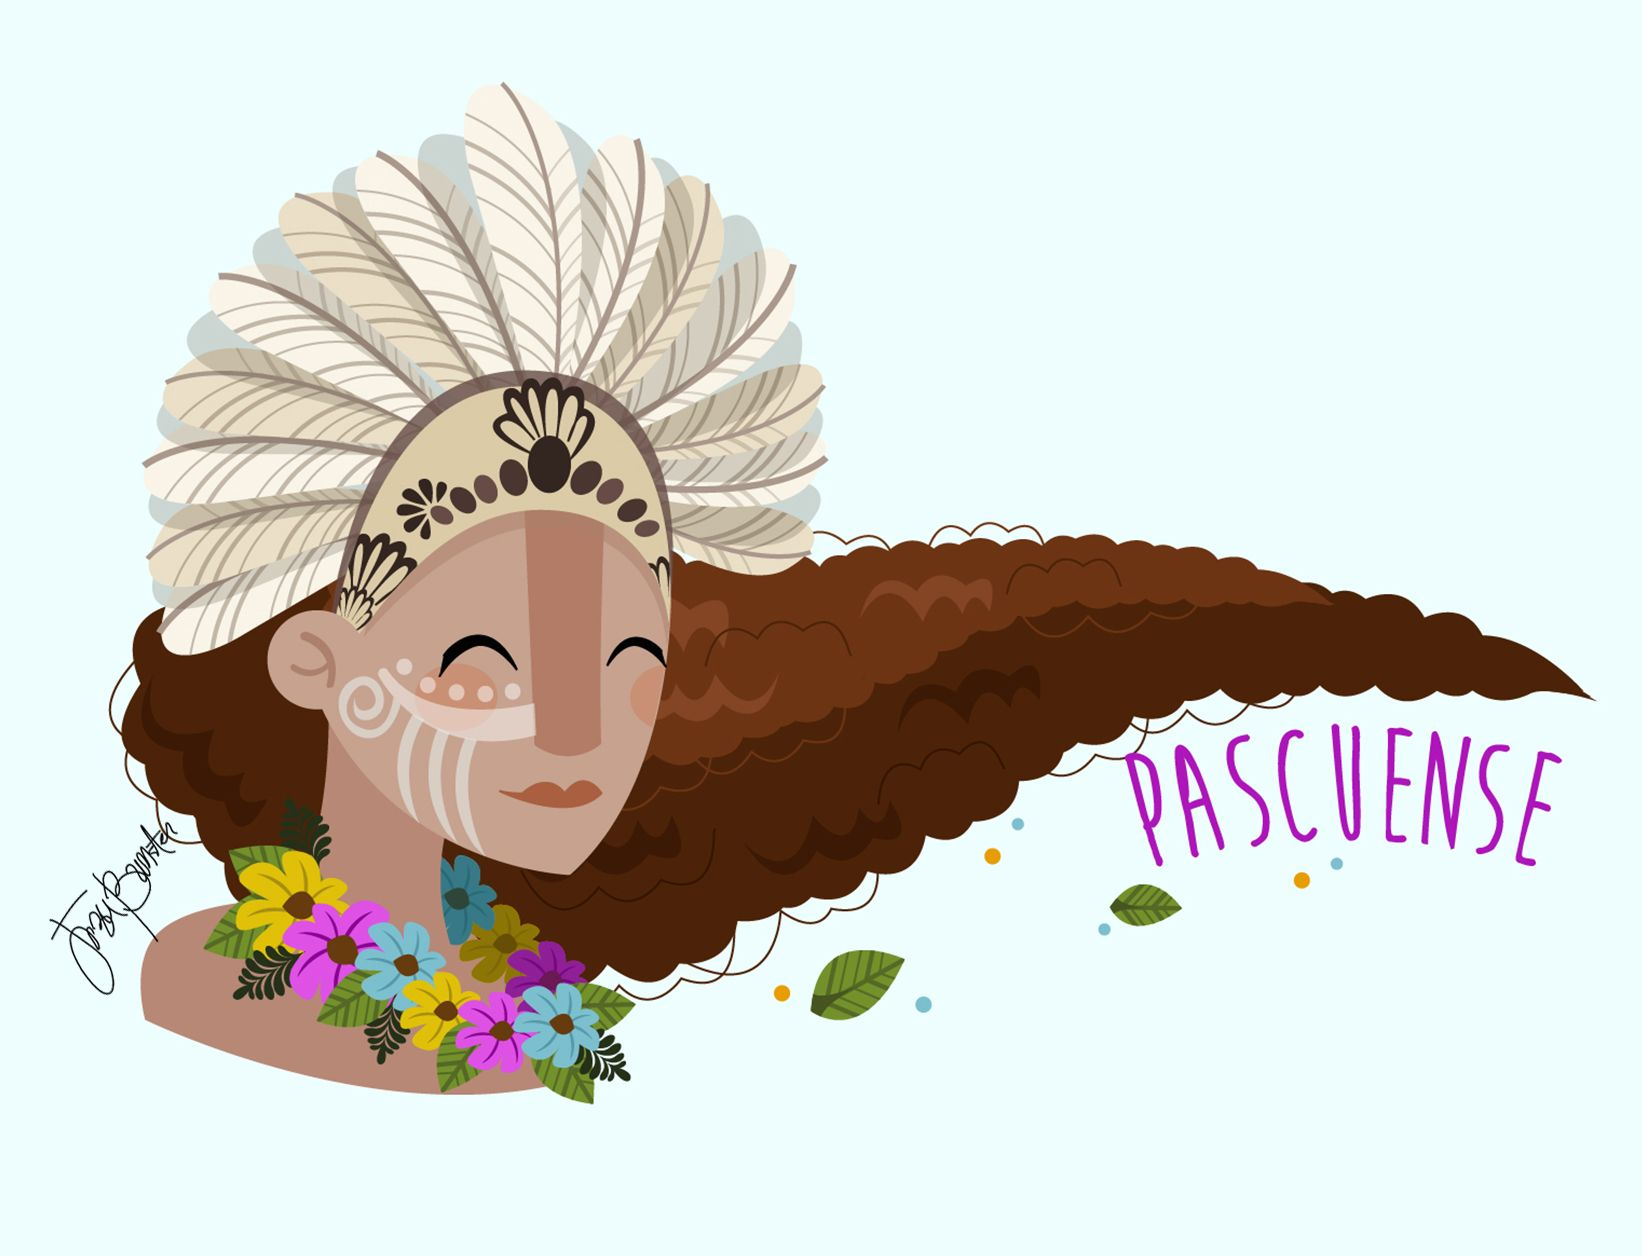 Jezu Bunster Illustrations Design Mujer Indigena PASCUENSE